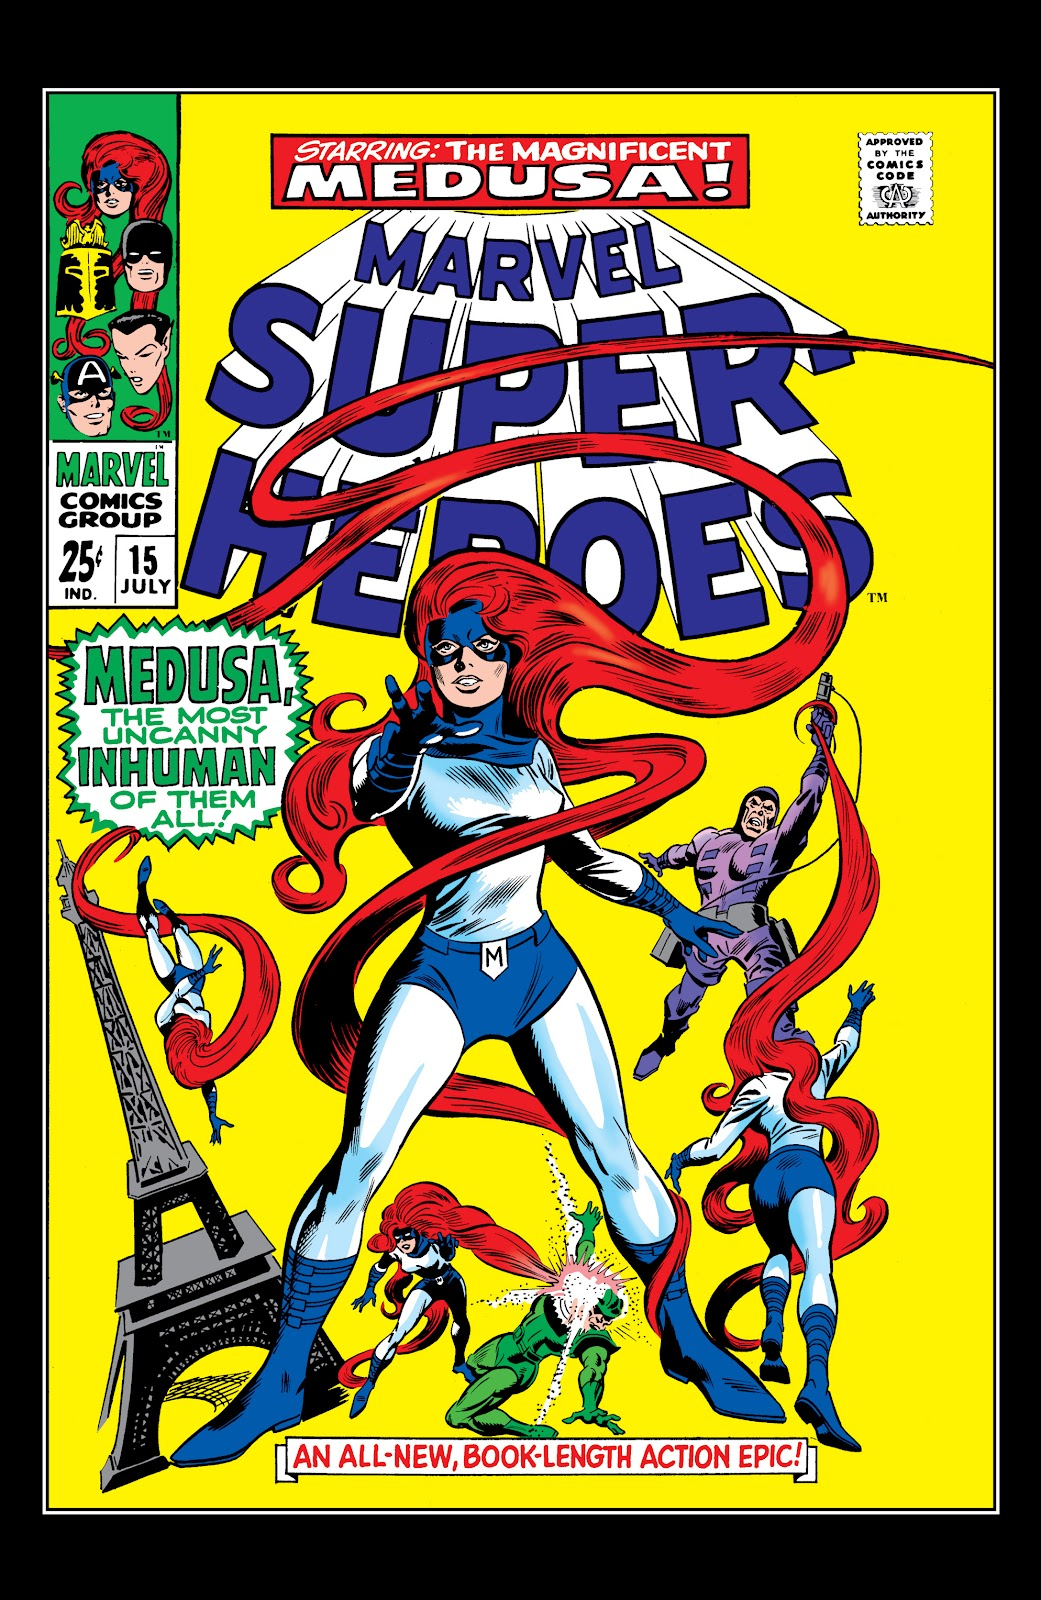 Read online Marvel Masterworks: The Inhumans comic -  Issue # TPB 1 (Part 1) - 43